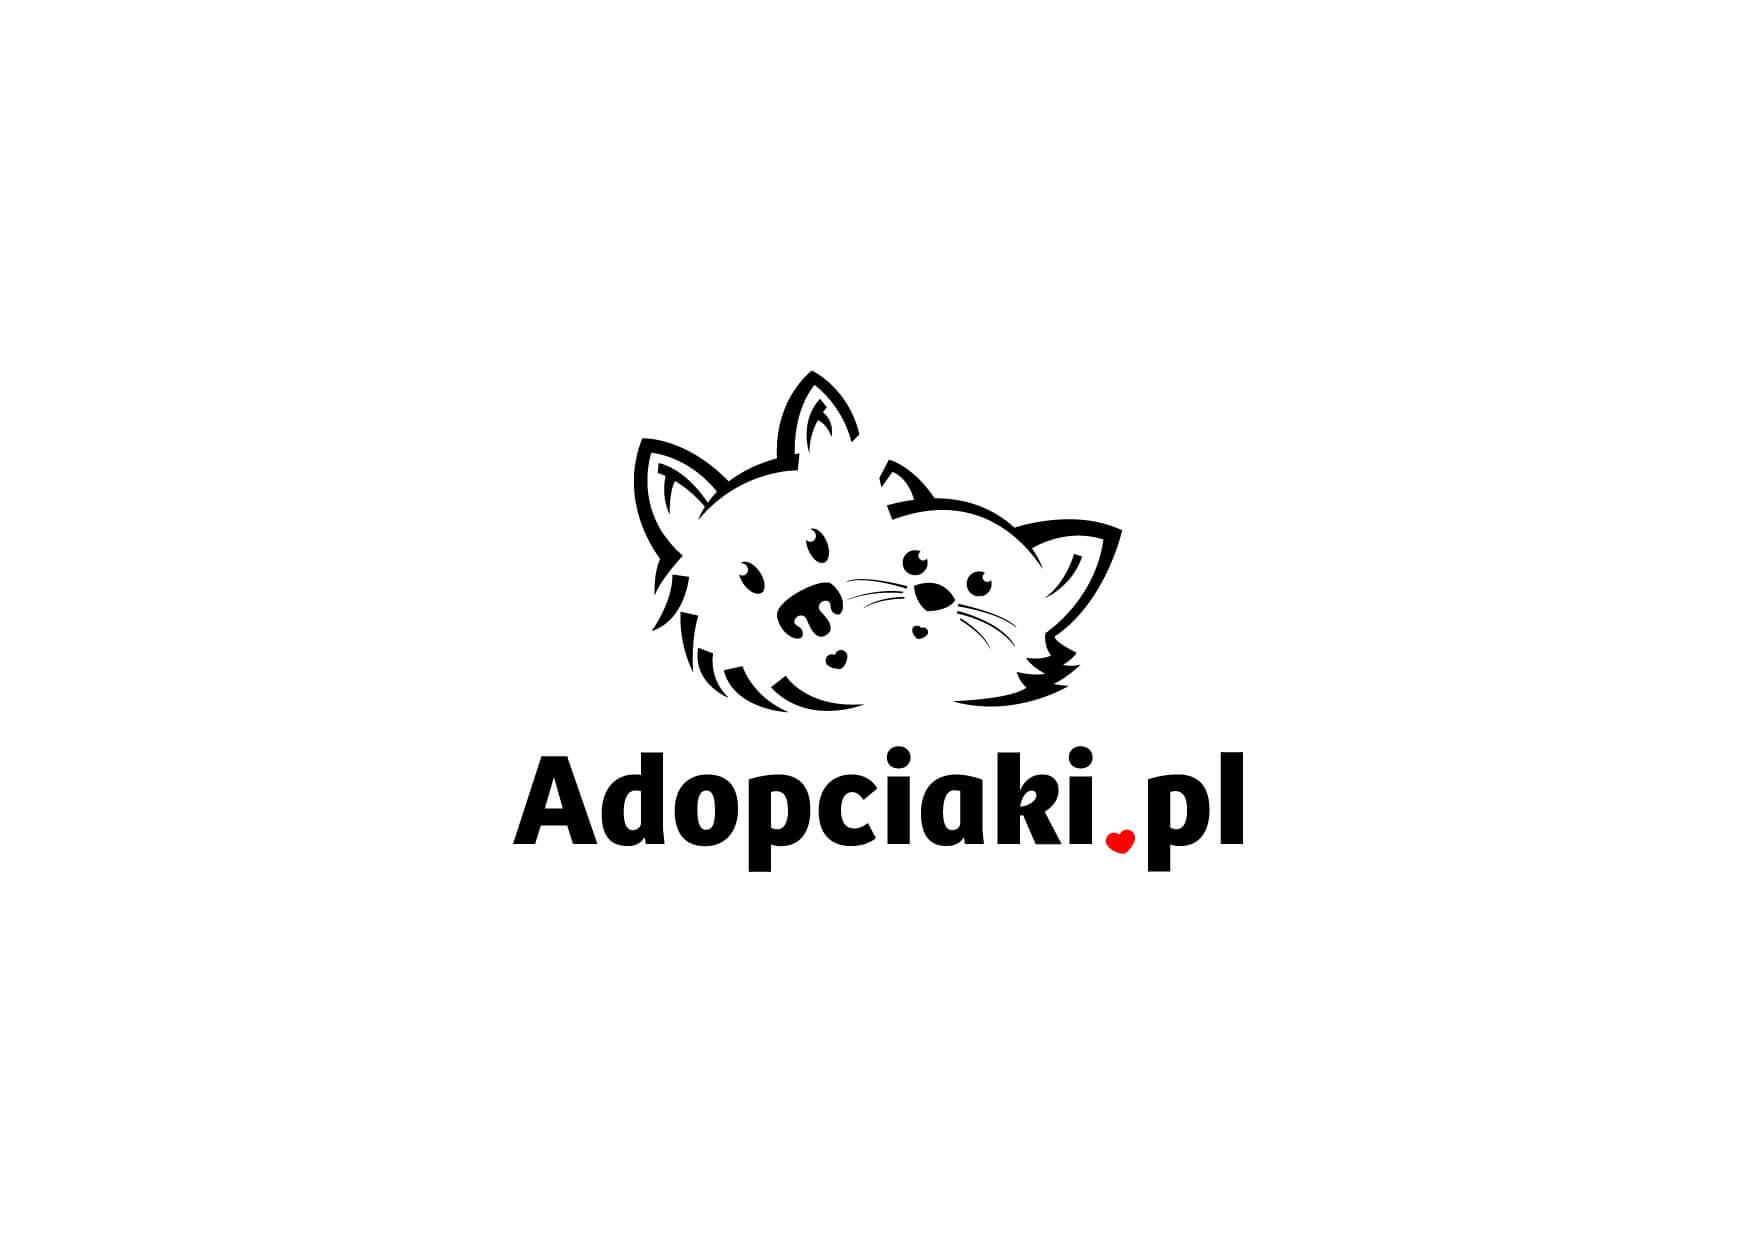 Logo Adopciaki.pl – Koszalin